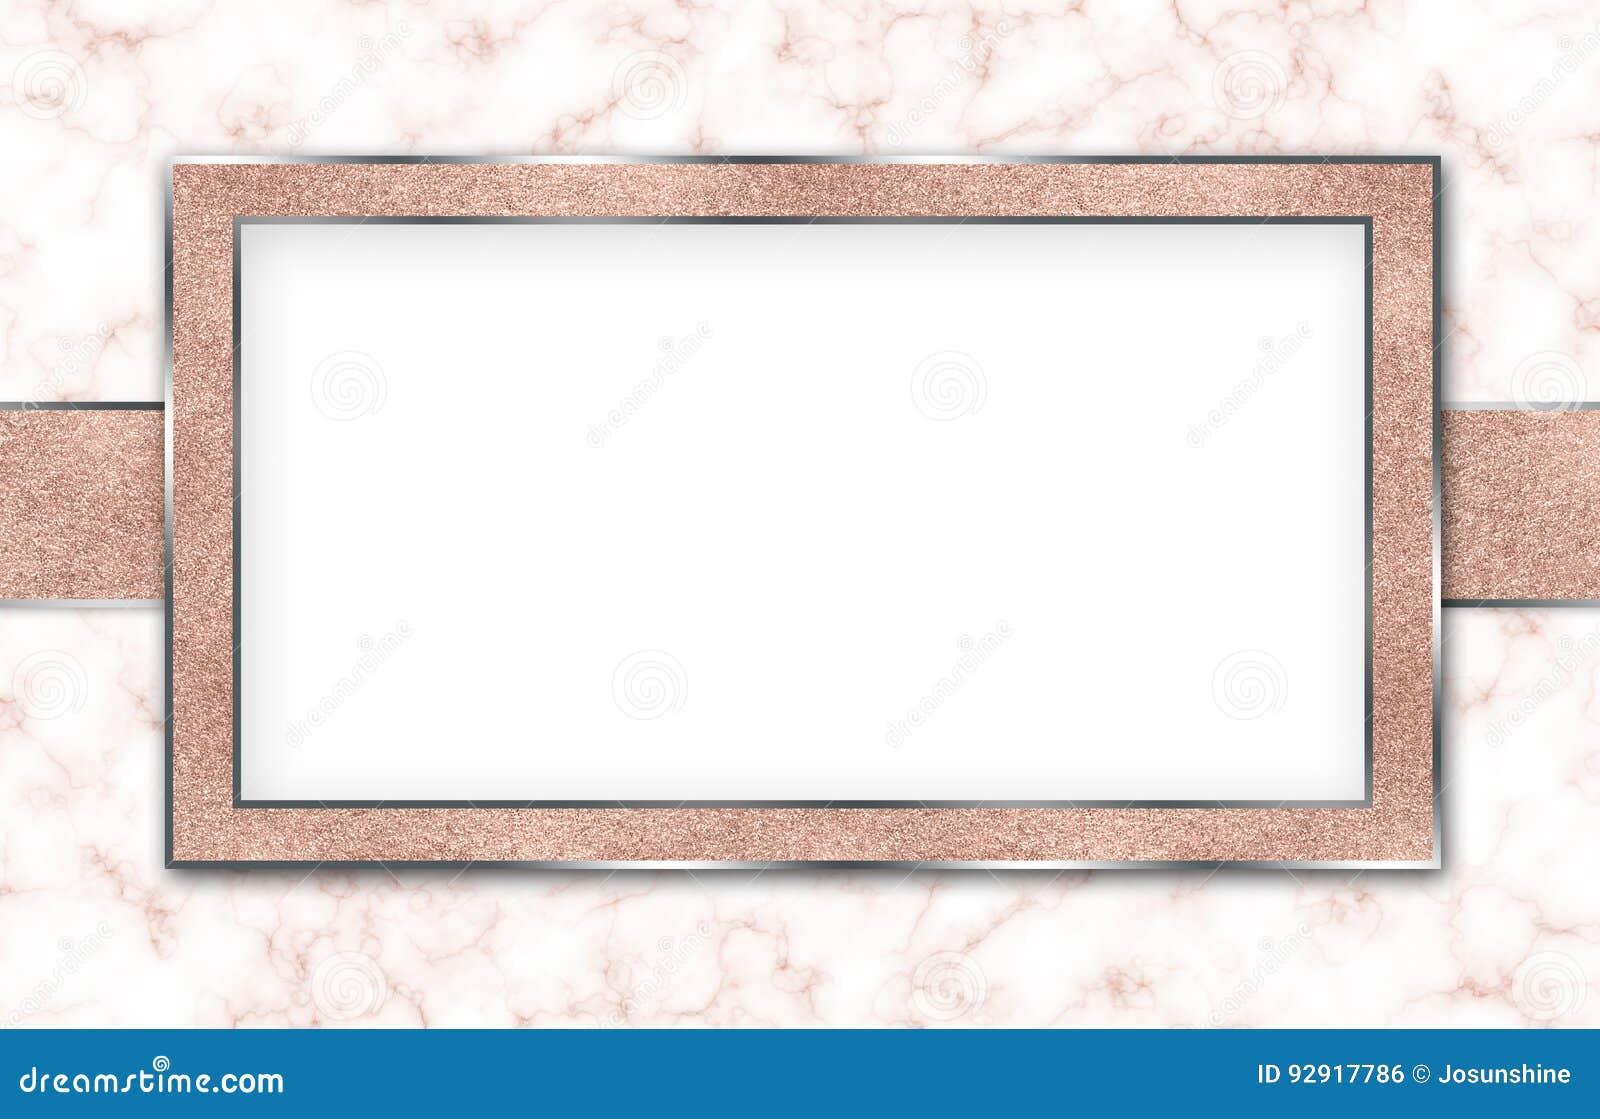 Marble Background Invitation Rose Gold White Stock